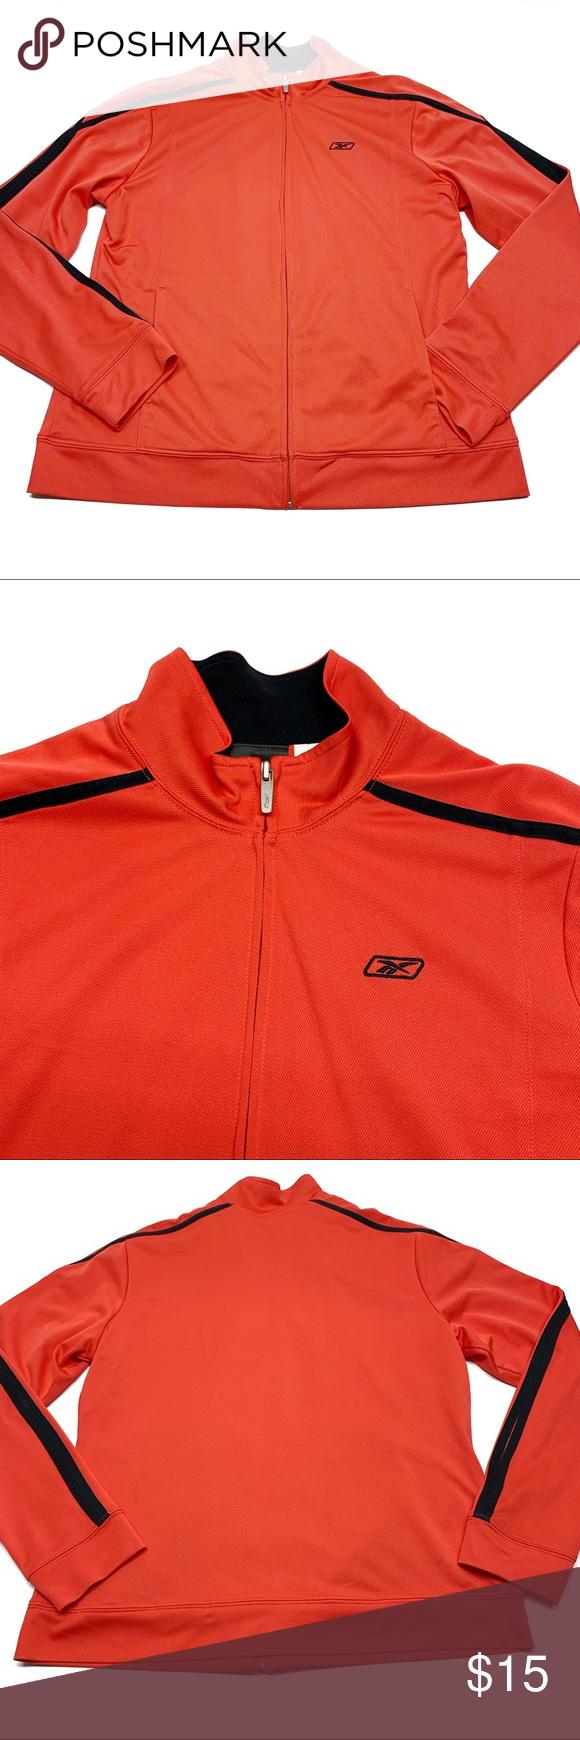 3 For 10 Sale Reebok Track Jacket K41 Jackets Track Jackets Clothes Design [ 1740 x 580 Pixel ]